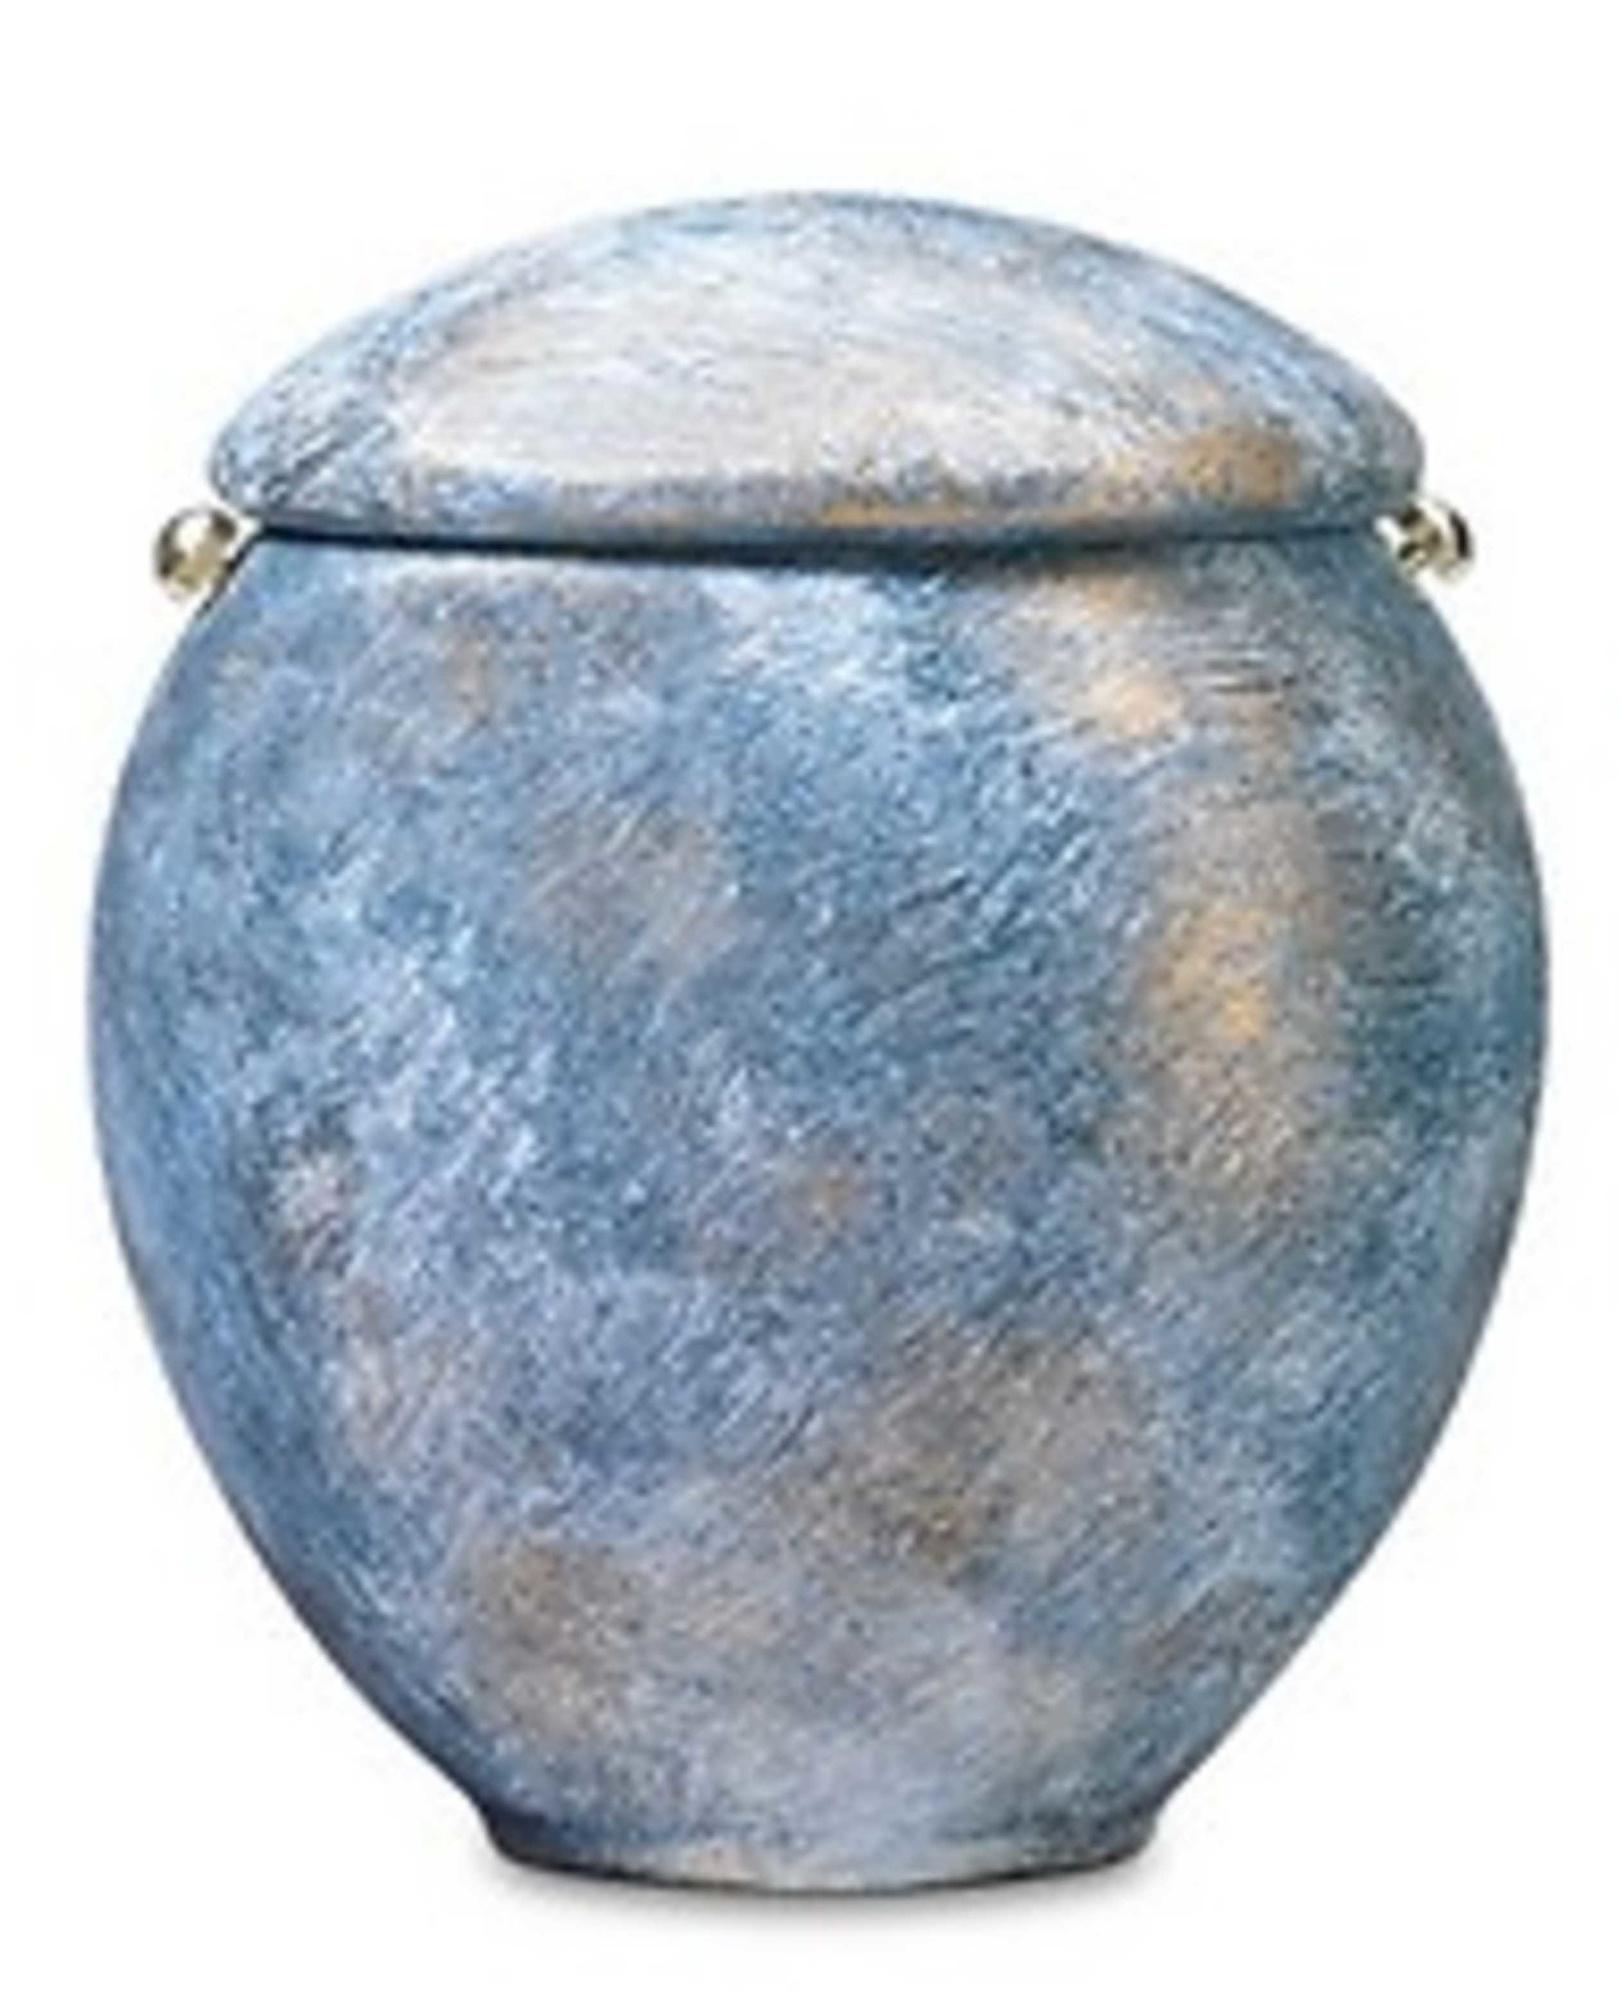 Urna Capacidad 1.5 litros